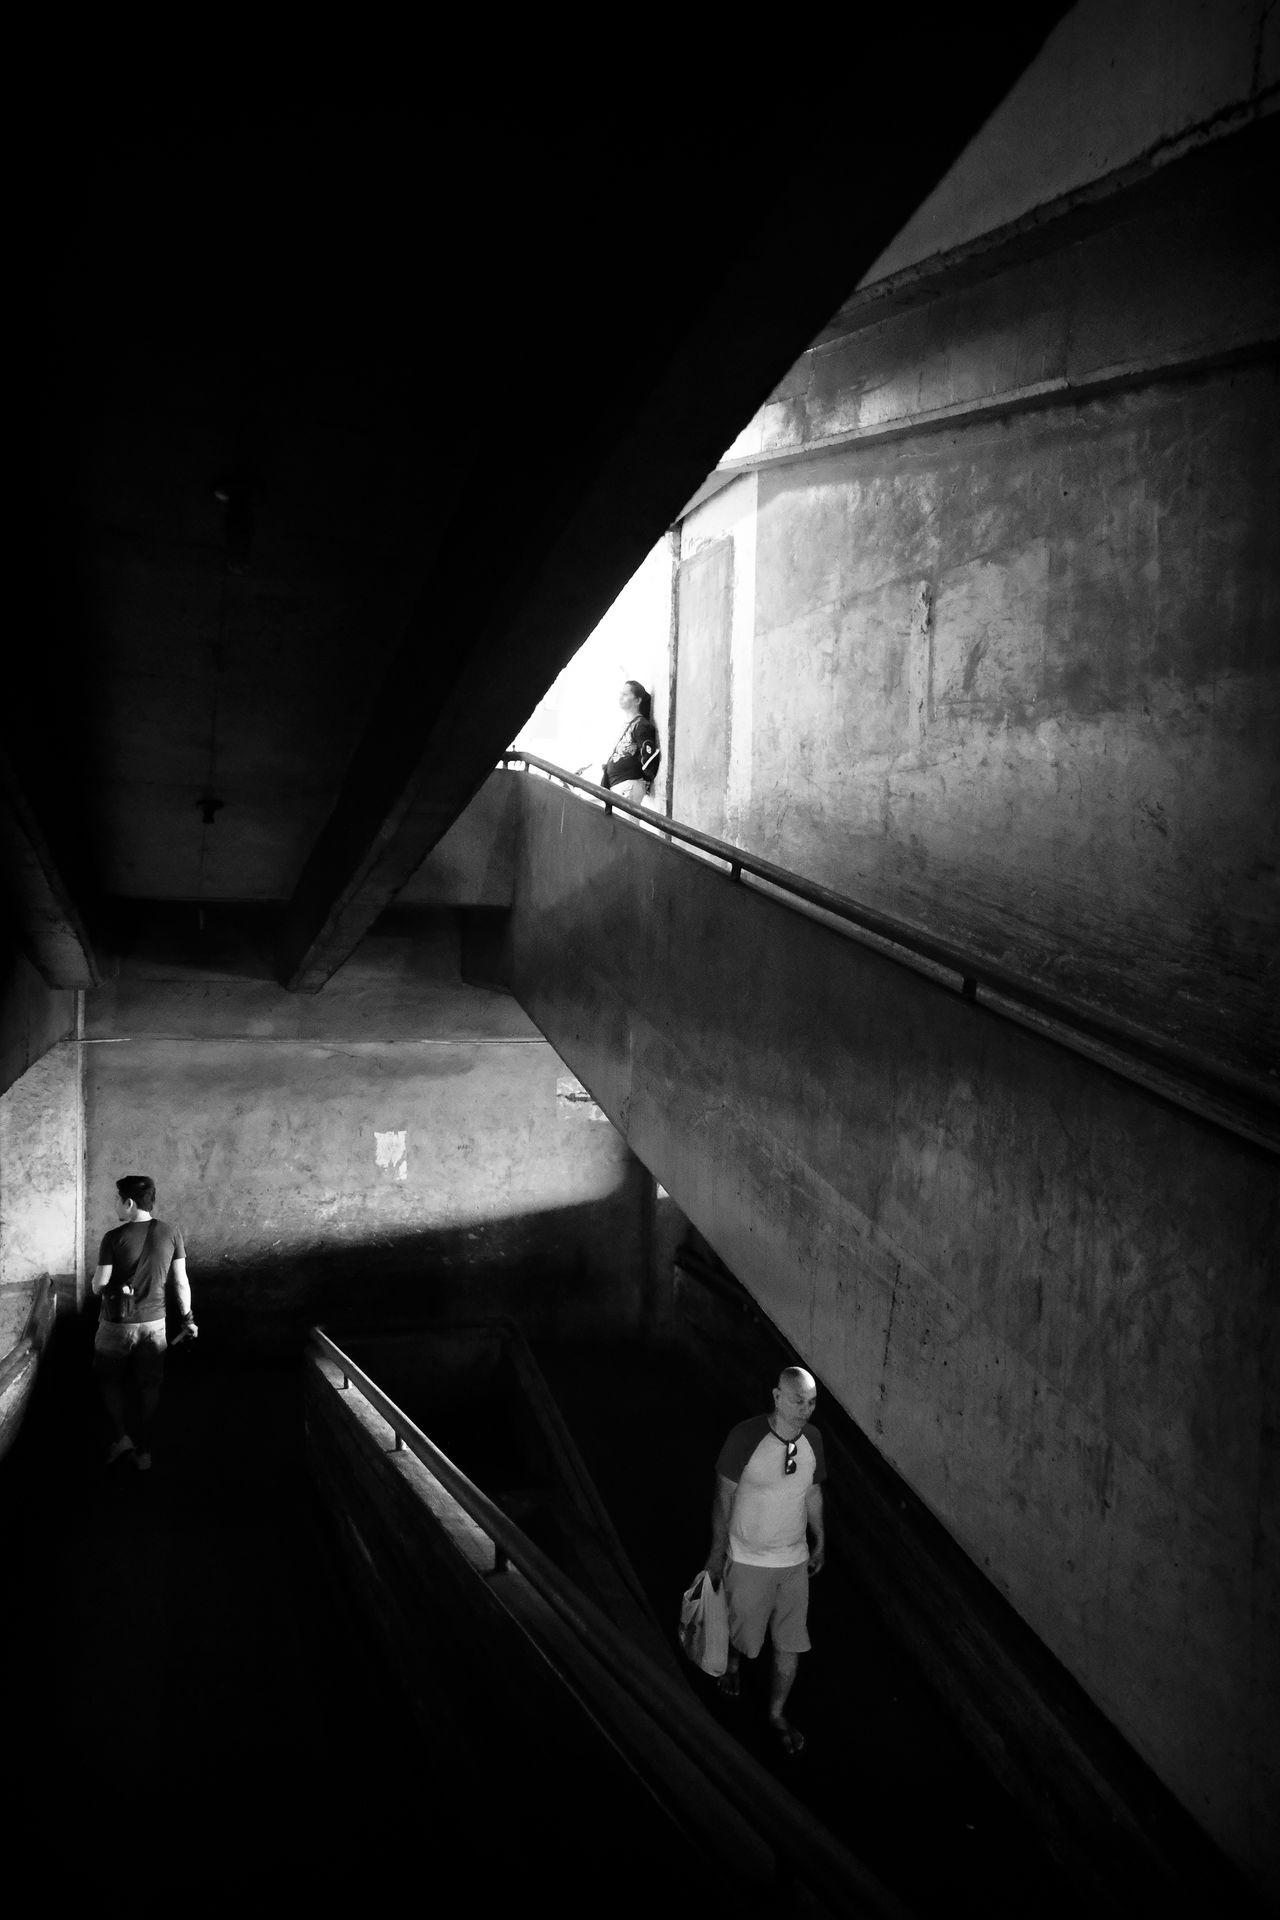 Fujifilm X-Pro2 XF18mmF2R. Sept 2016. Street Photography Eyeem Philippines Philippines XF18mmF2.0 Fujifilm X-pro2 Light And Shadow Cagayan De Oro City Fujifilm_xseries Xf18mm Monochrome Monochrome Photography